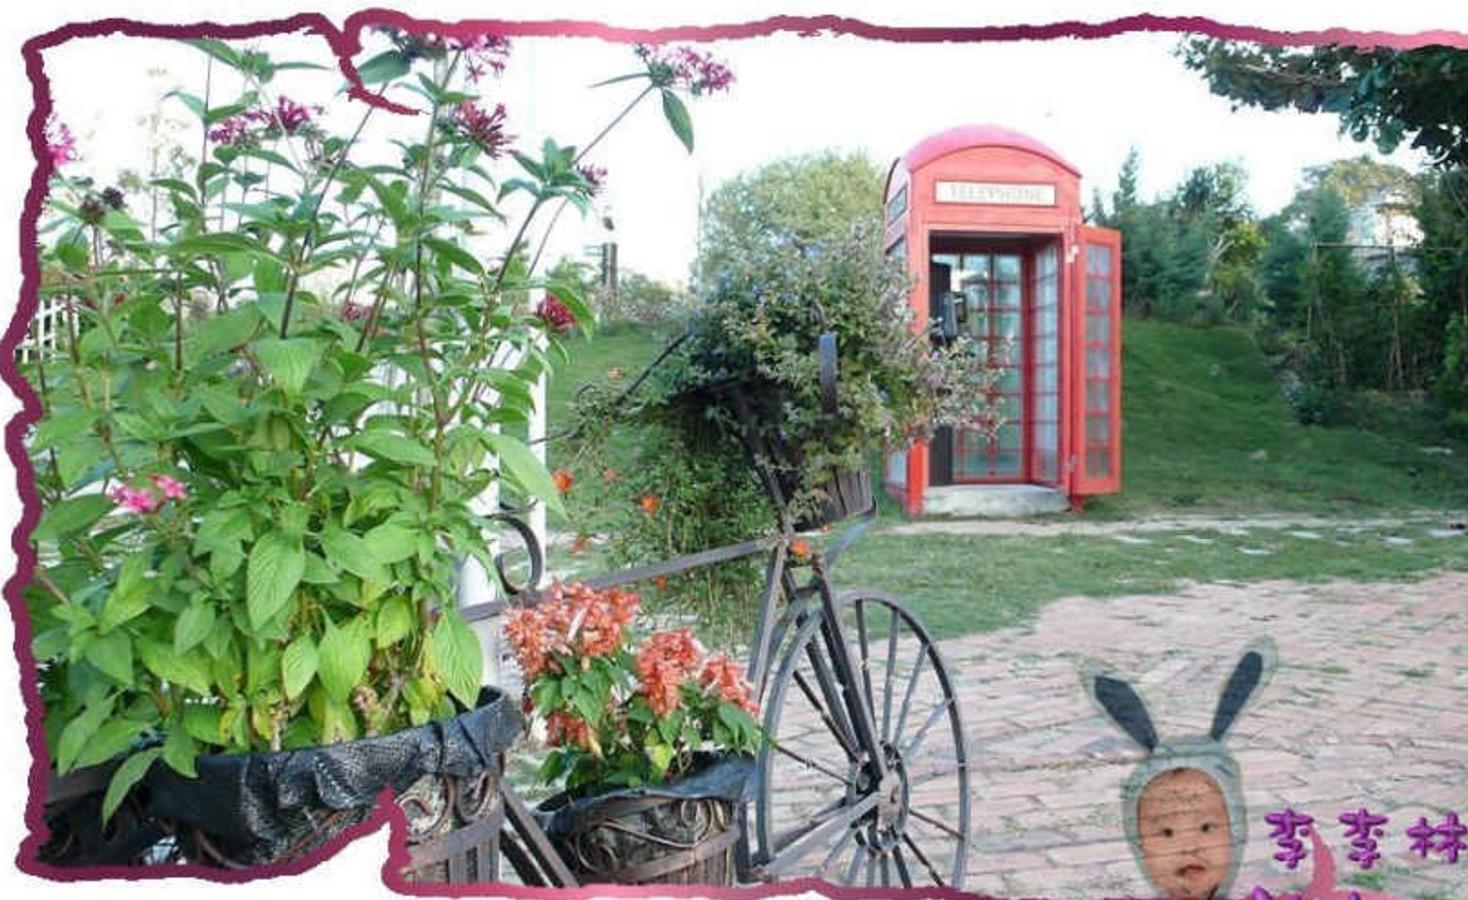 vilavilla魔法莊園|原山居印象|苗栗卓蘭景觀餐廳